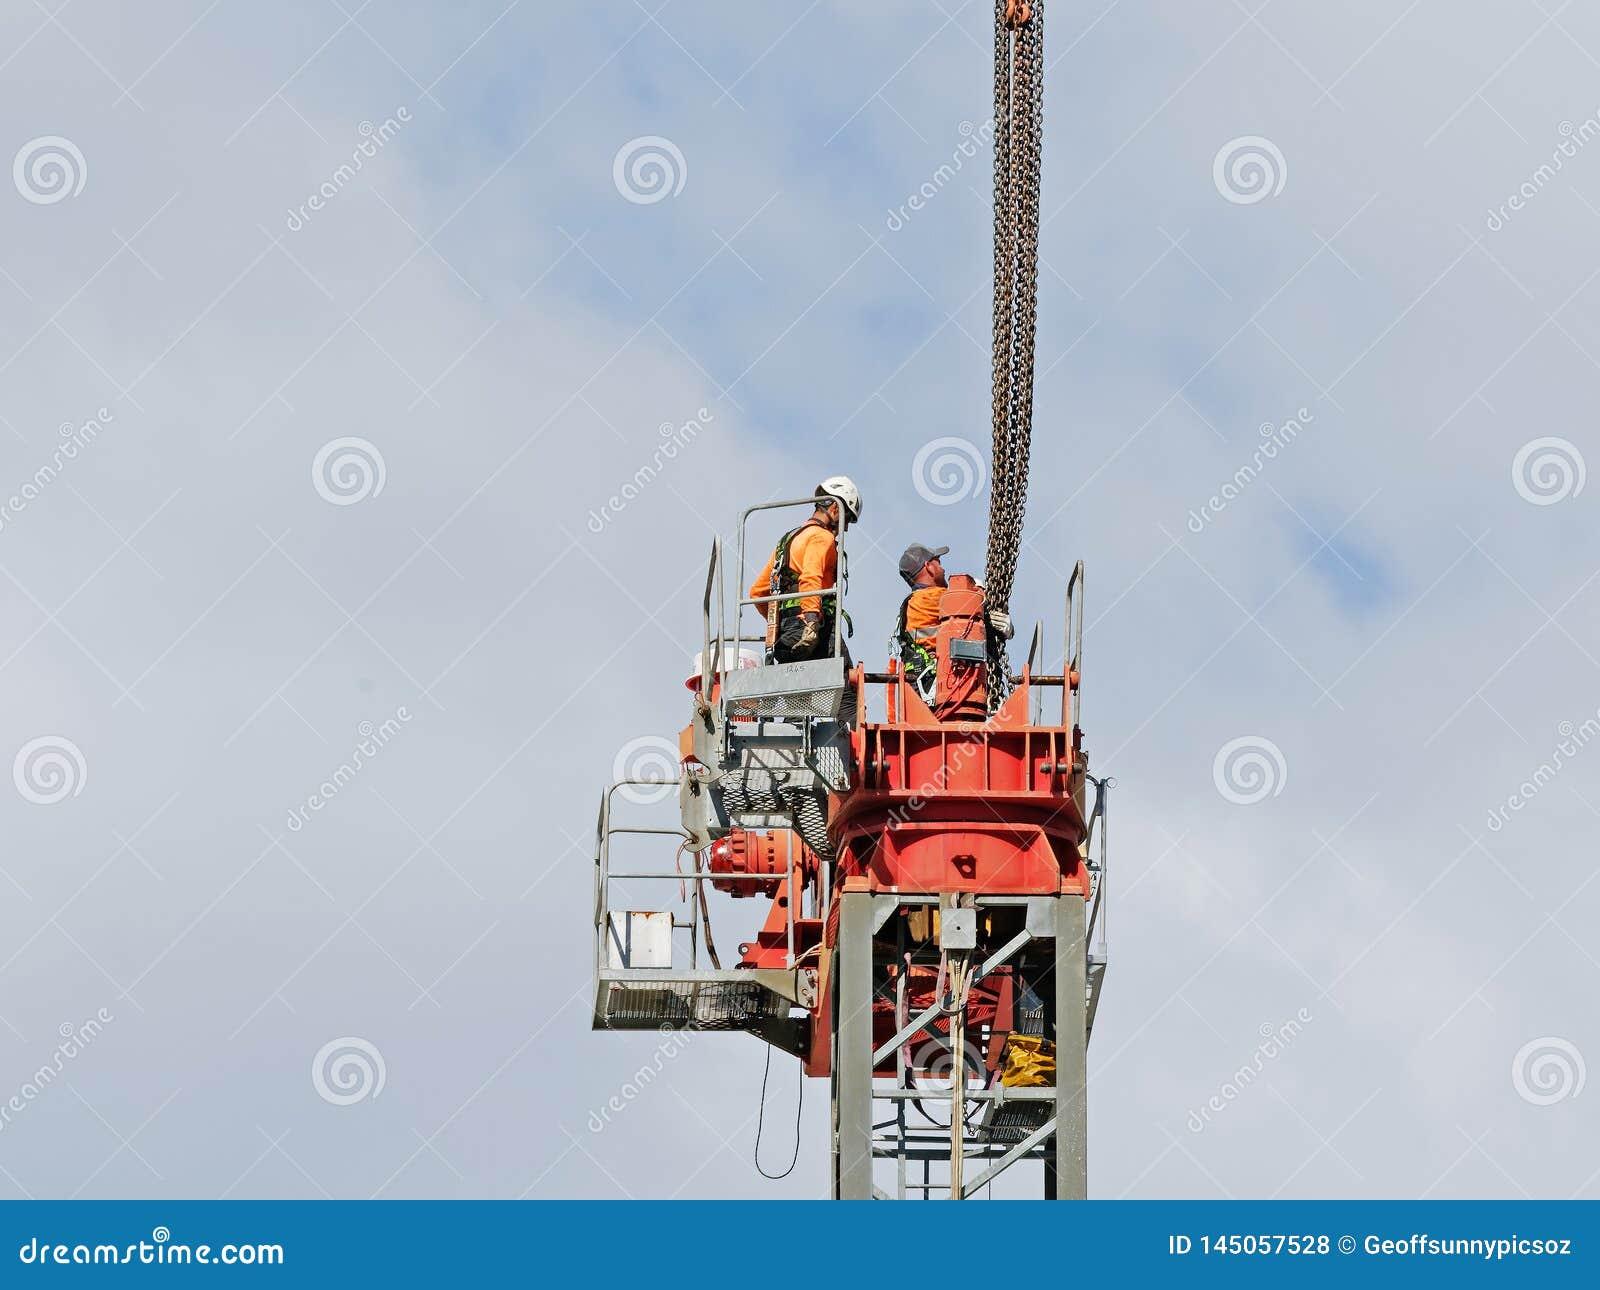 Construction crane removal. Update ed317. Gosford. April 9, 2019